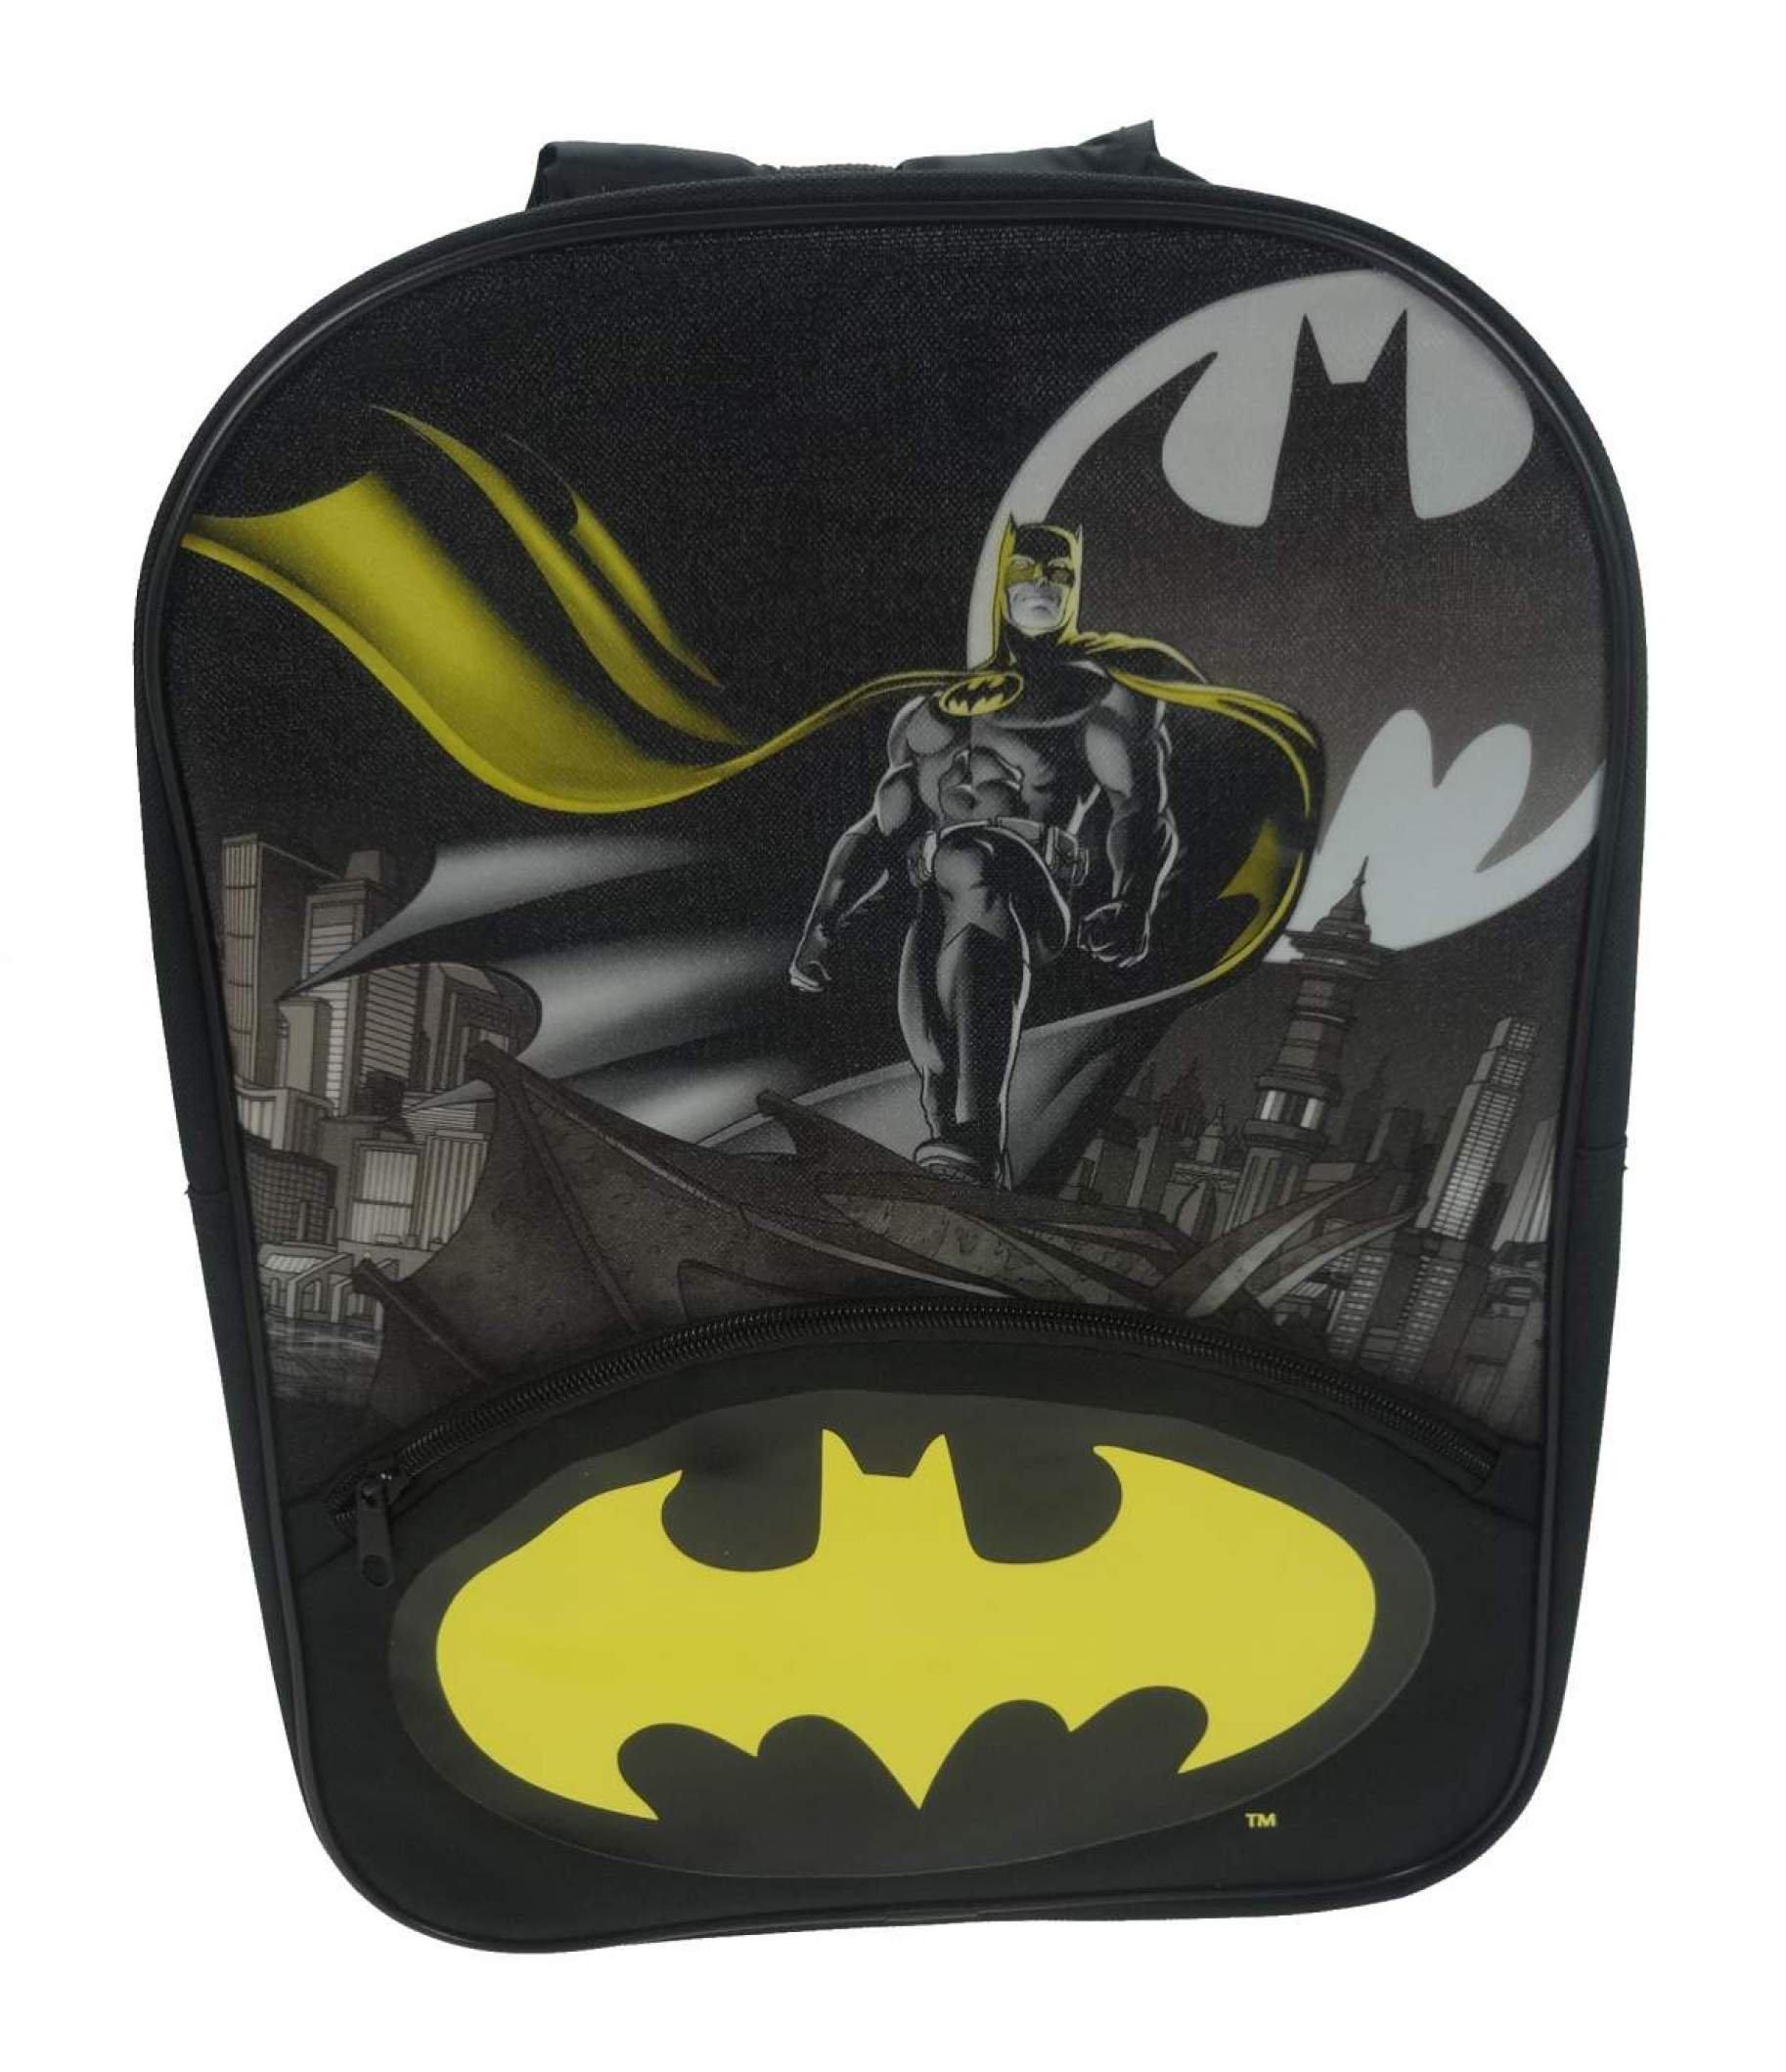 Batman 'Knight Sparkle' School Bag Rucksack Backpack